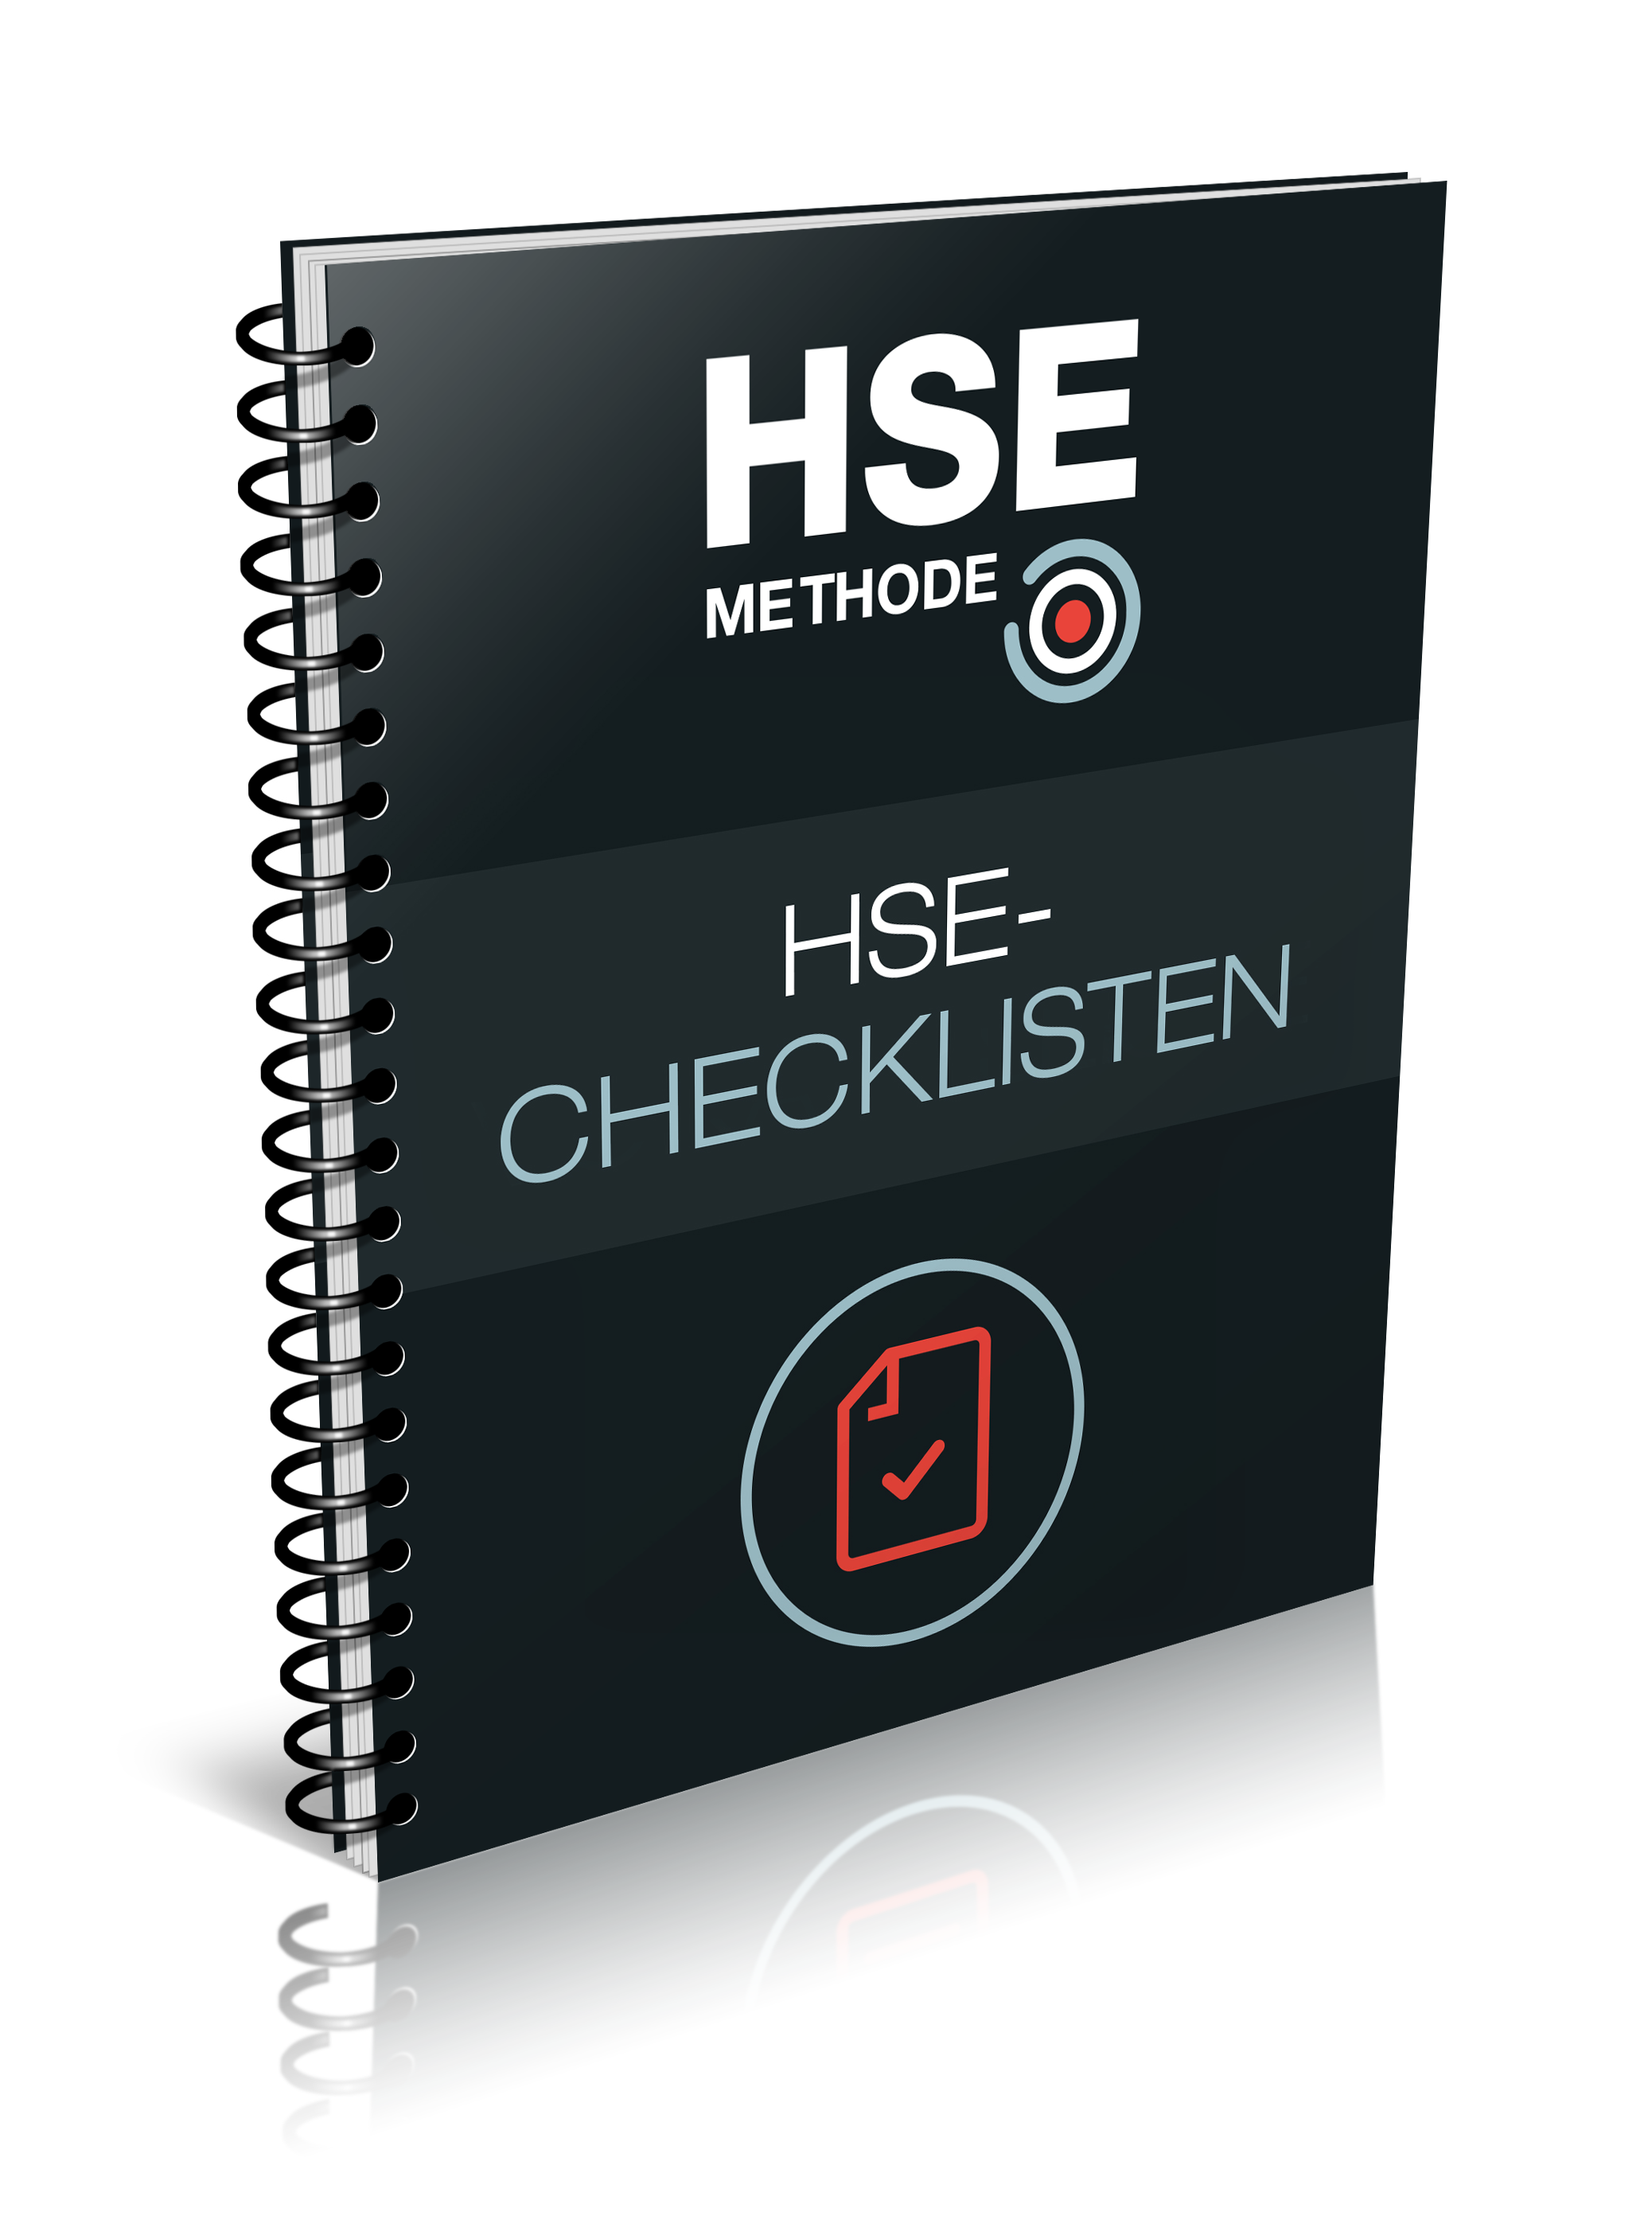 HSE_Checklisten_v1_rz